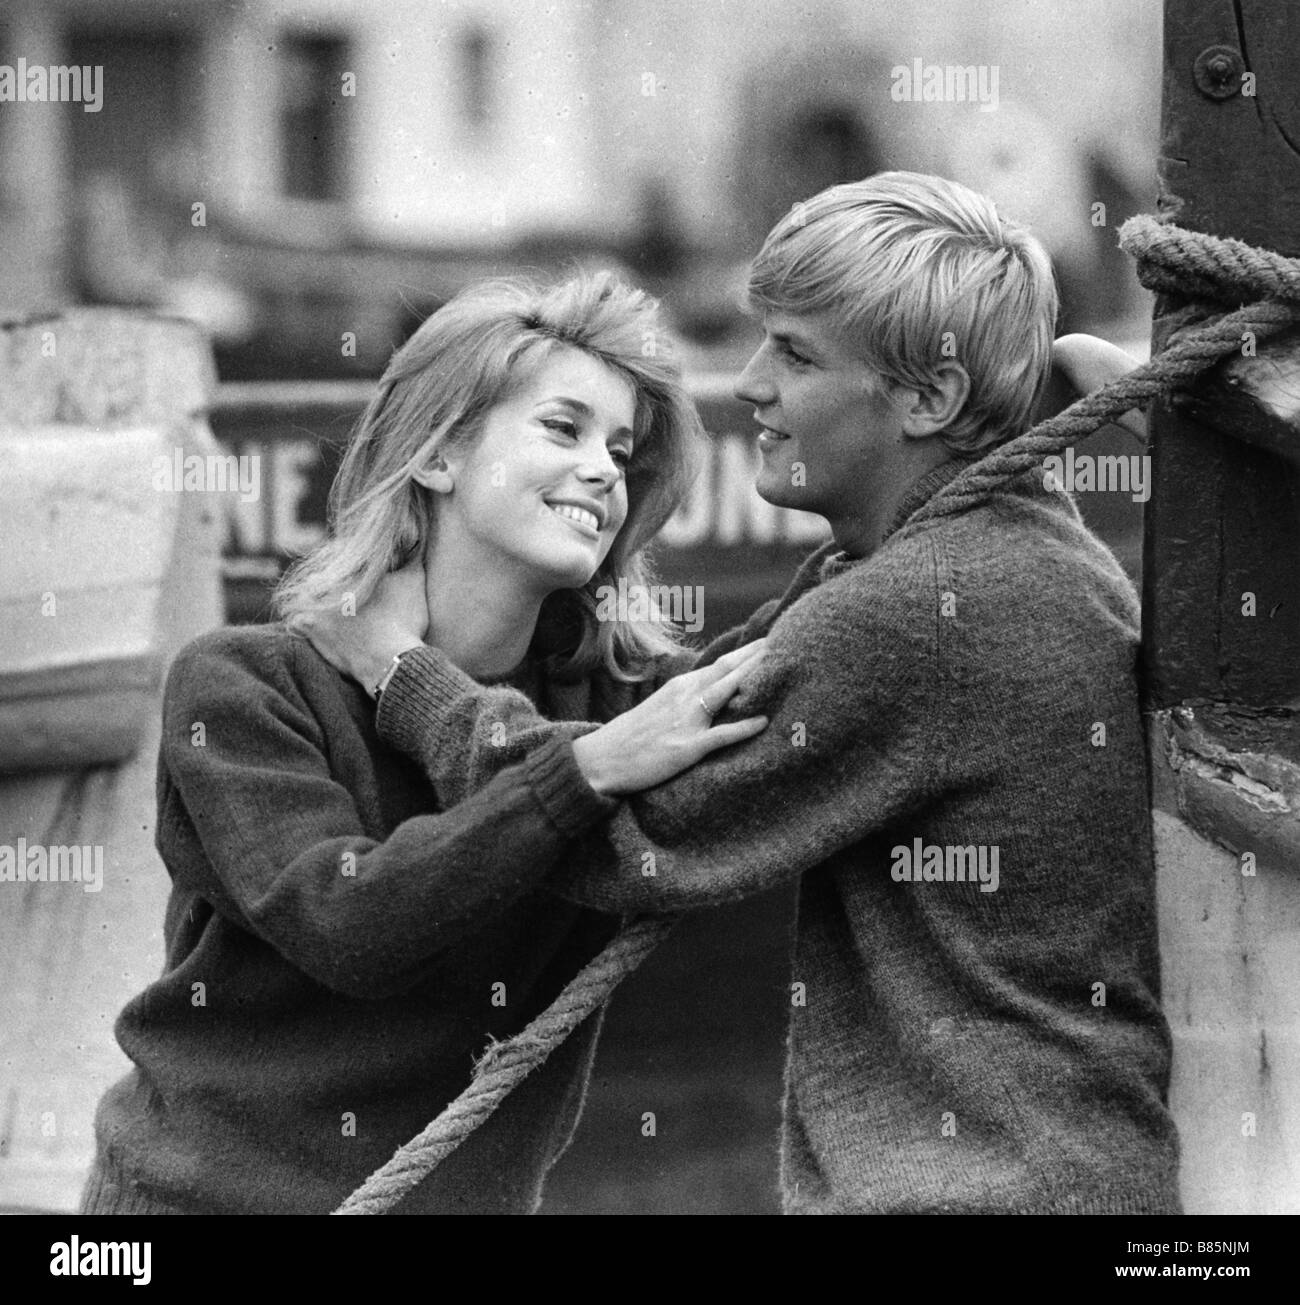 Catherine Deneuve and Jacques Perrin (April 4, 1962)